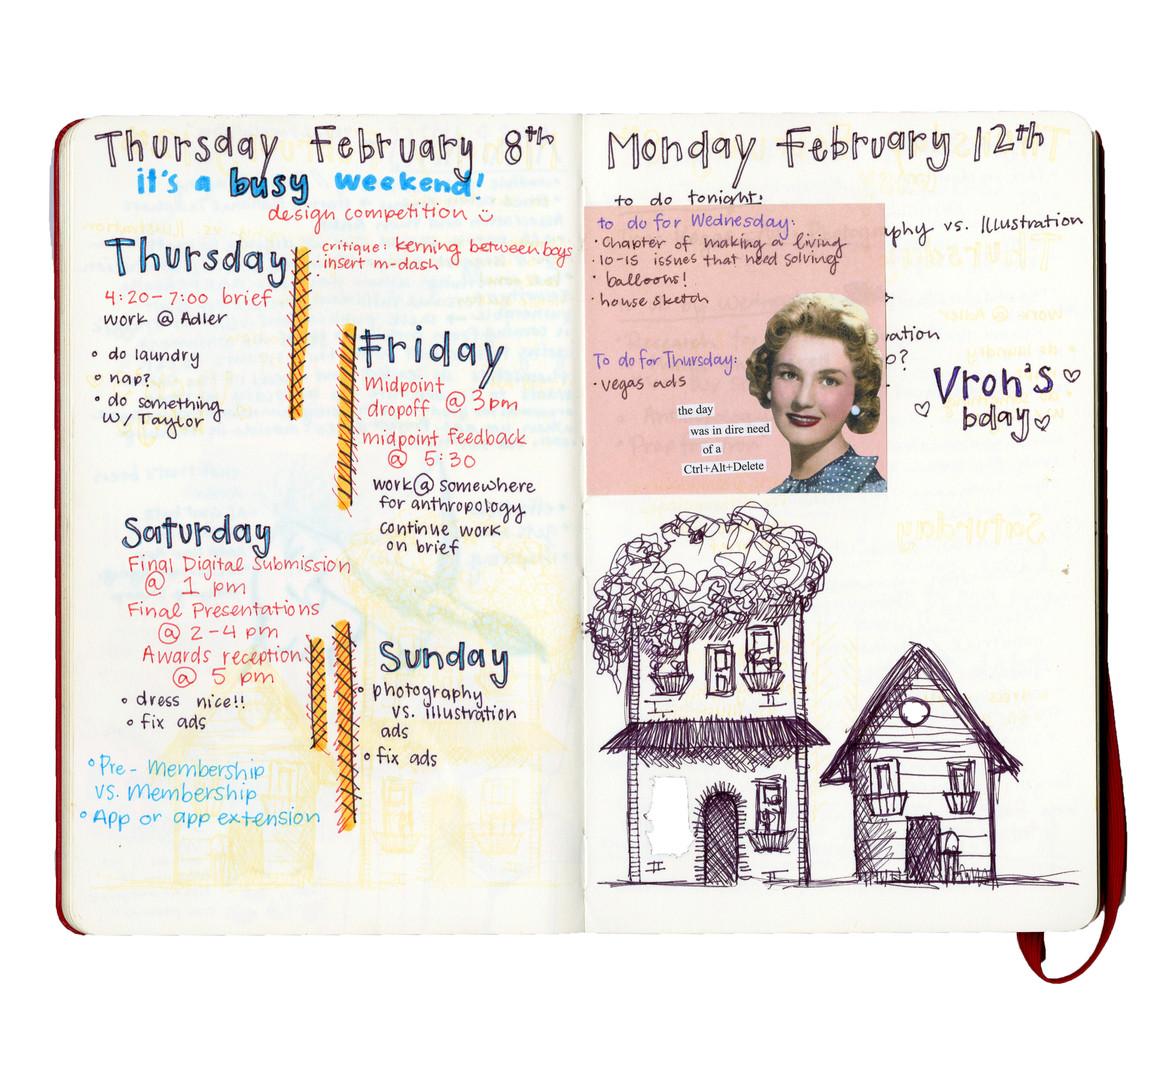 February 8th